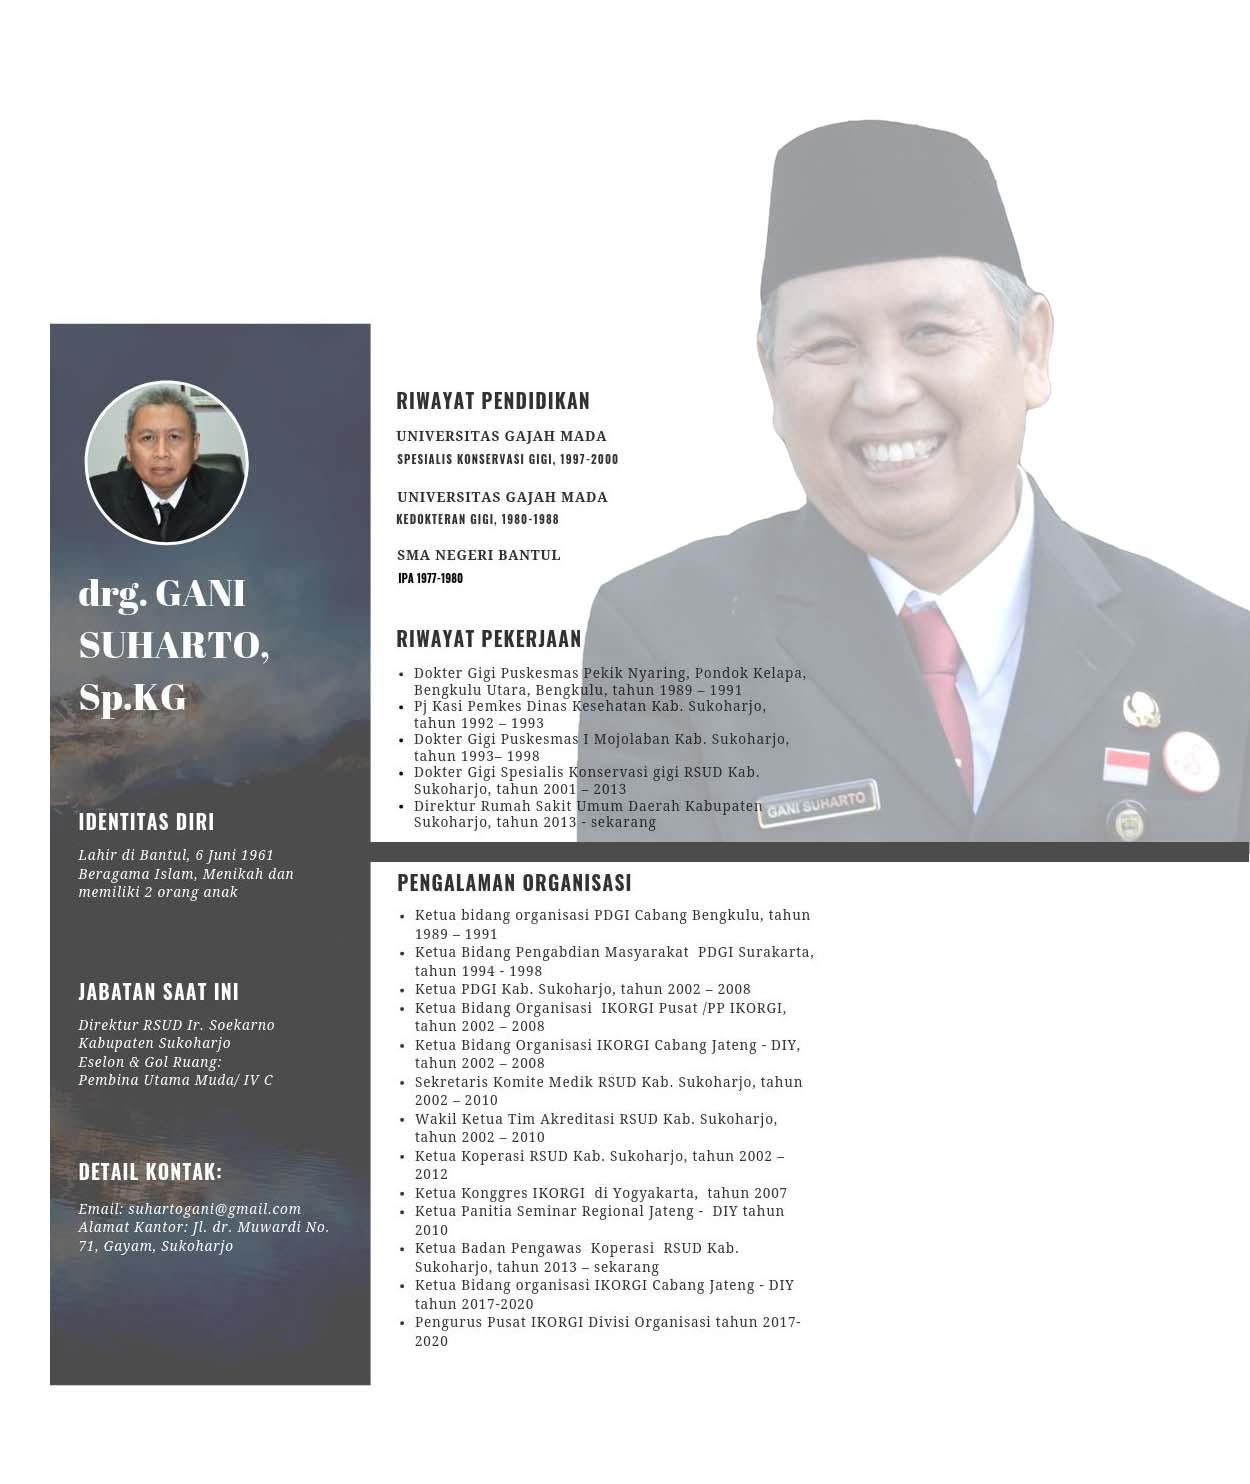 Profil Direktur